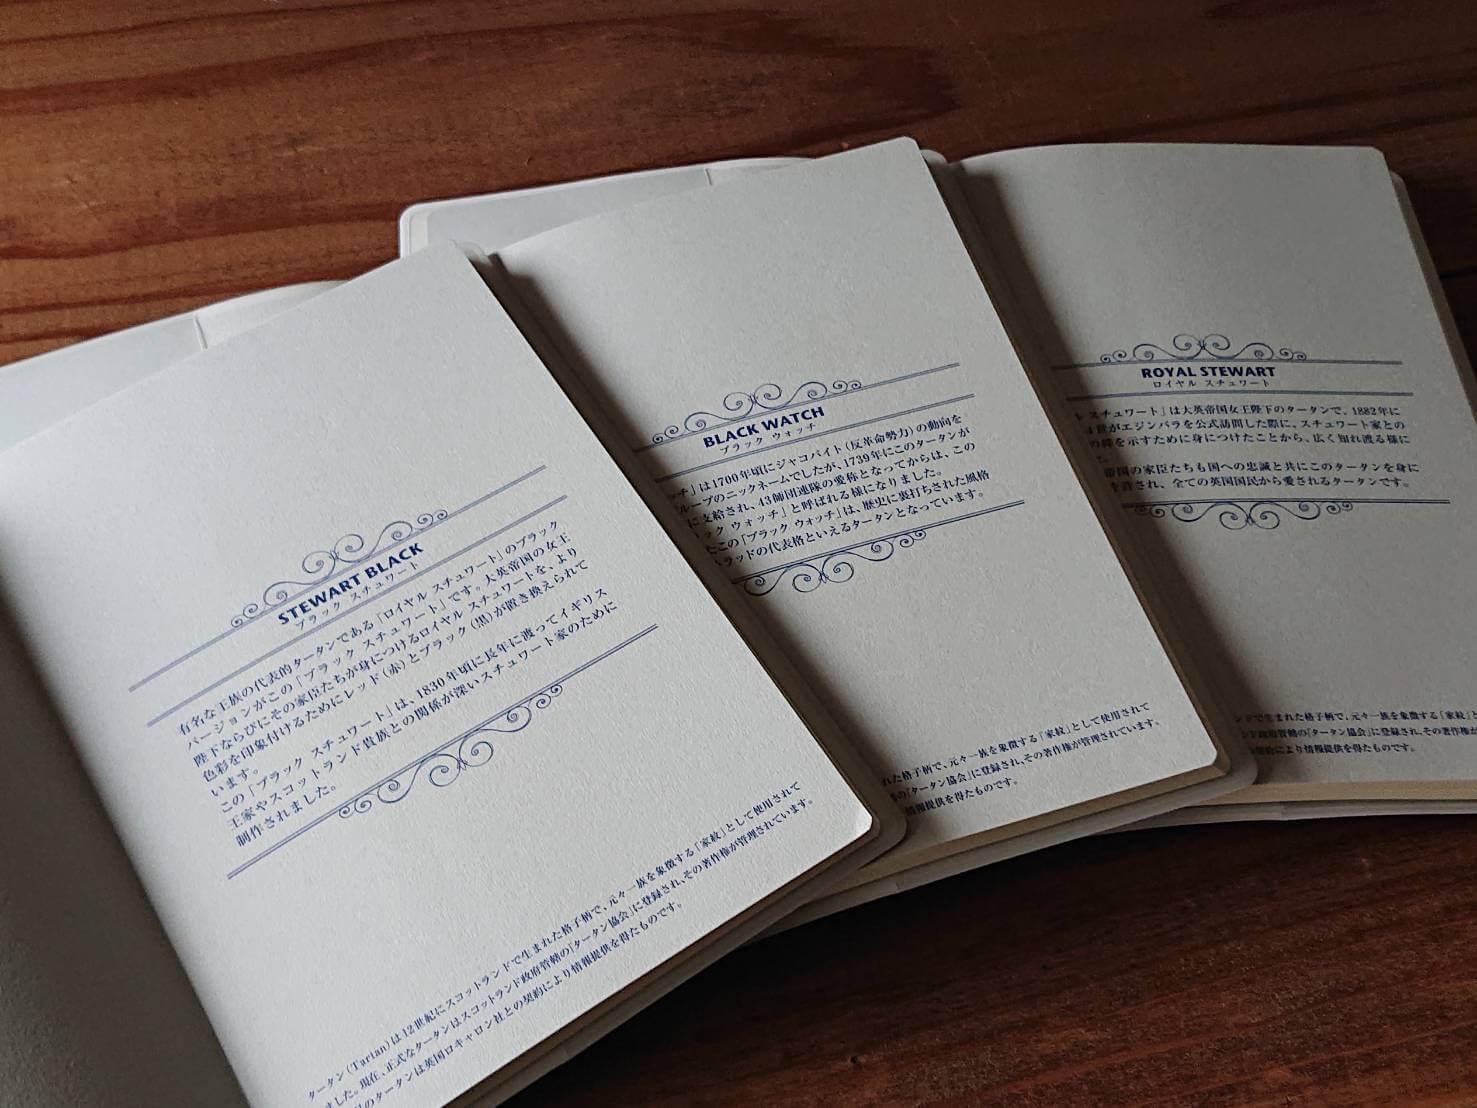 Tartan check note 小物もトラディショナルでタータンチェックのノート